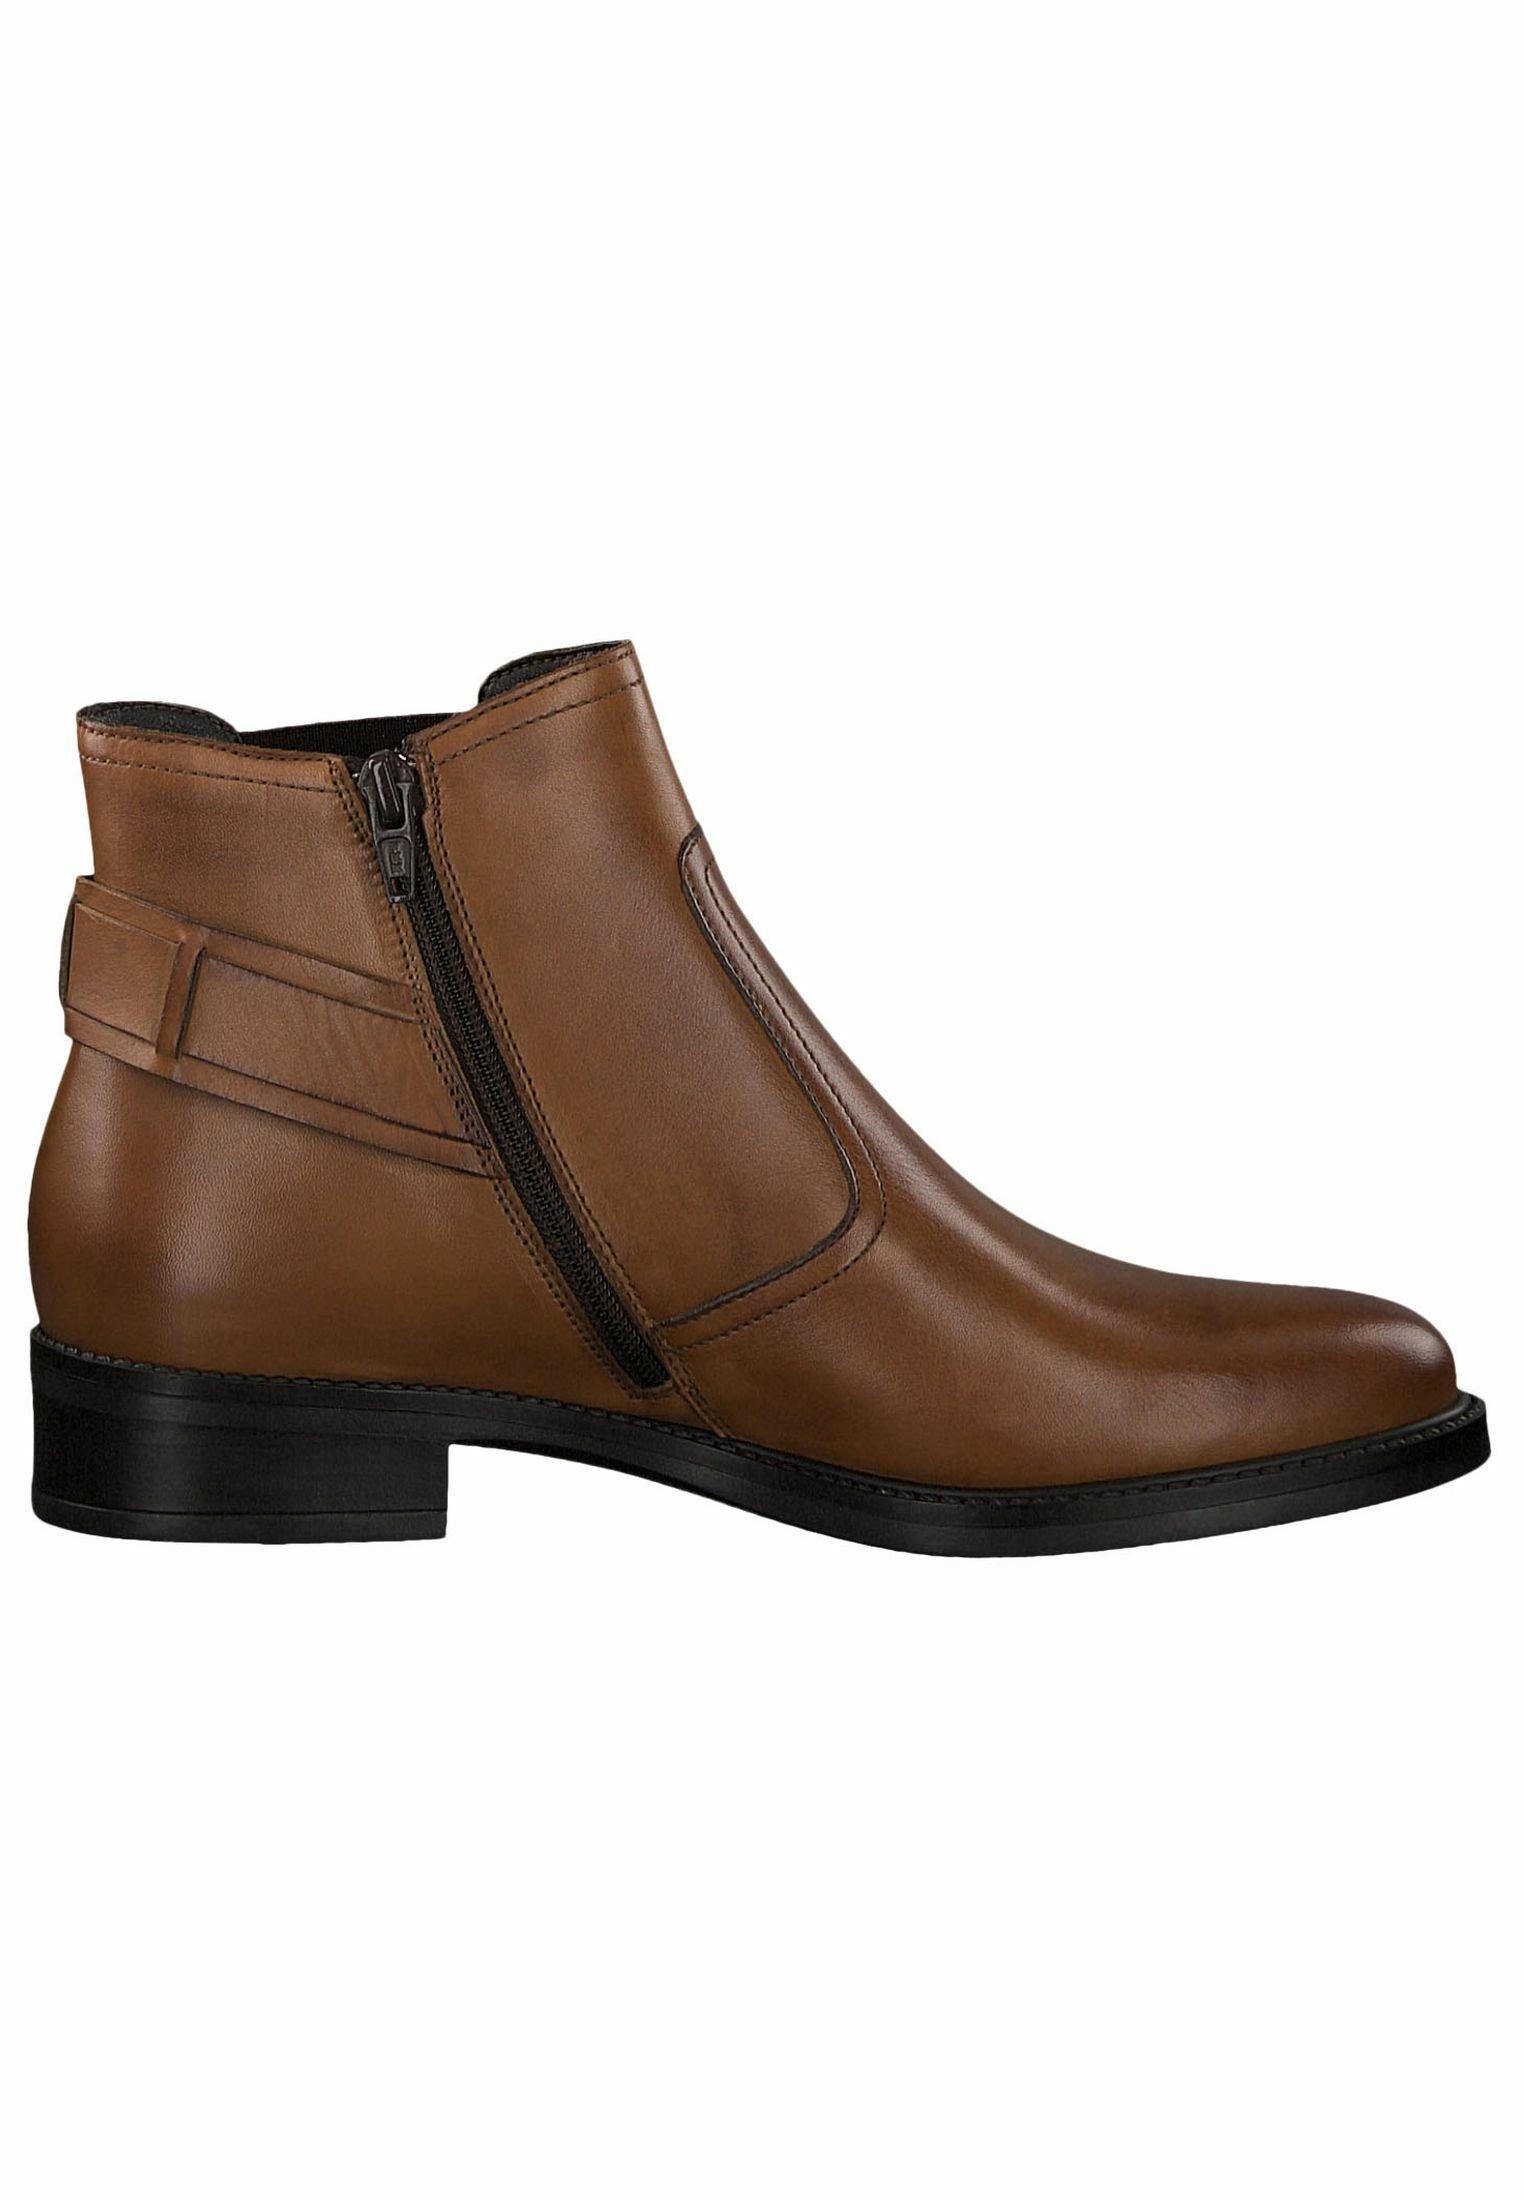 2020 Cool Sale Women's Shoes Tamaris Classic ankle boots nut yodFjS0kE rDGIK271n